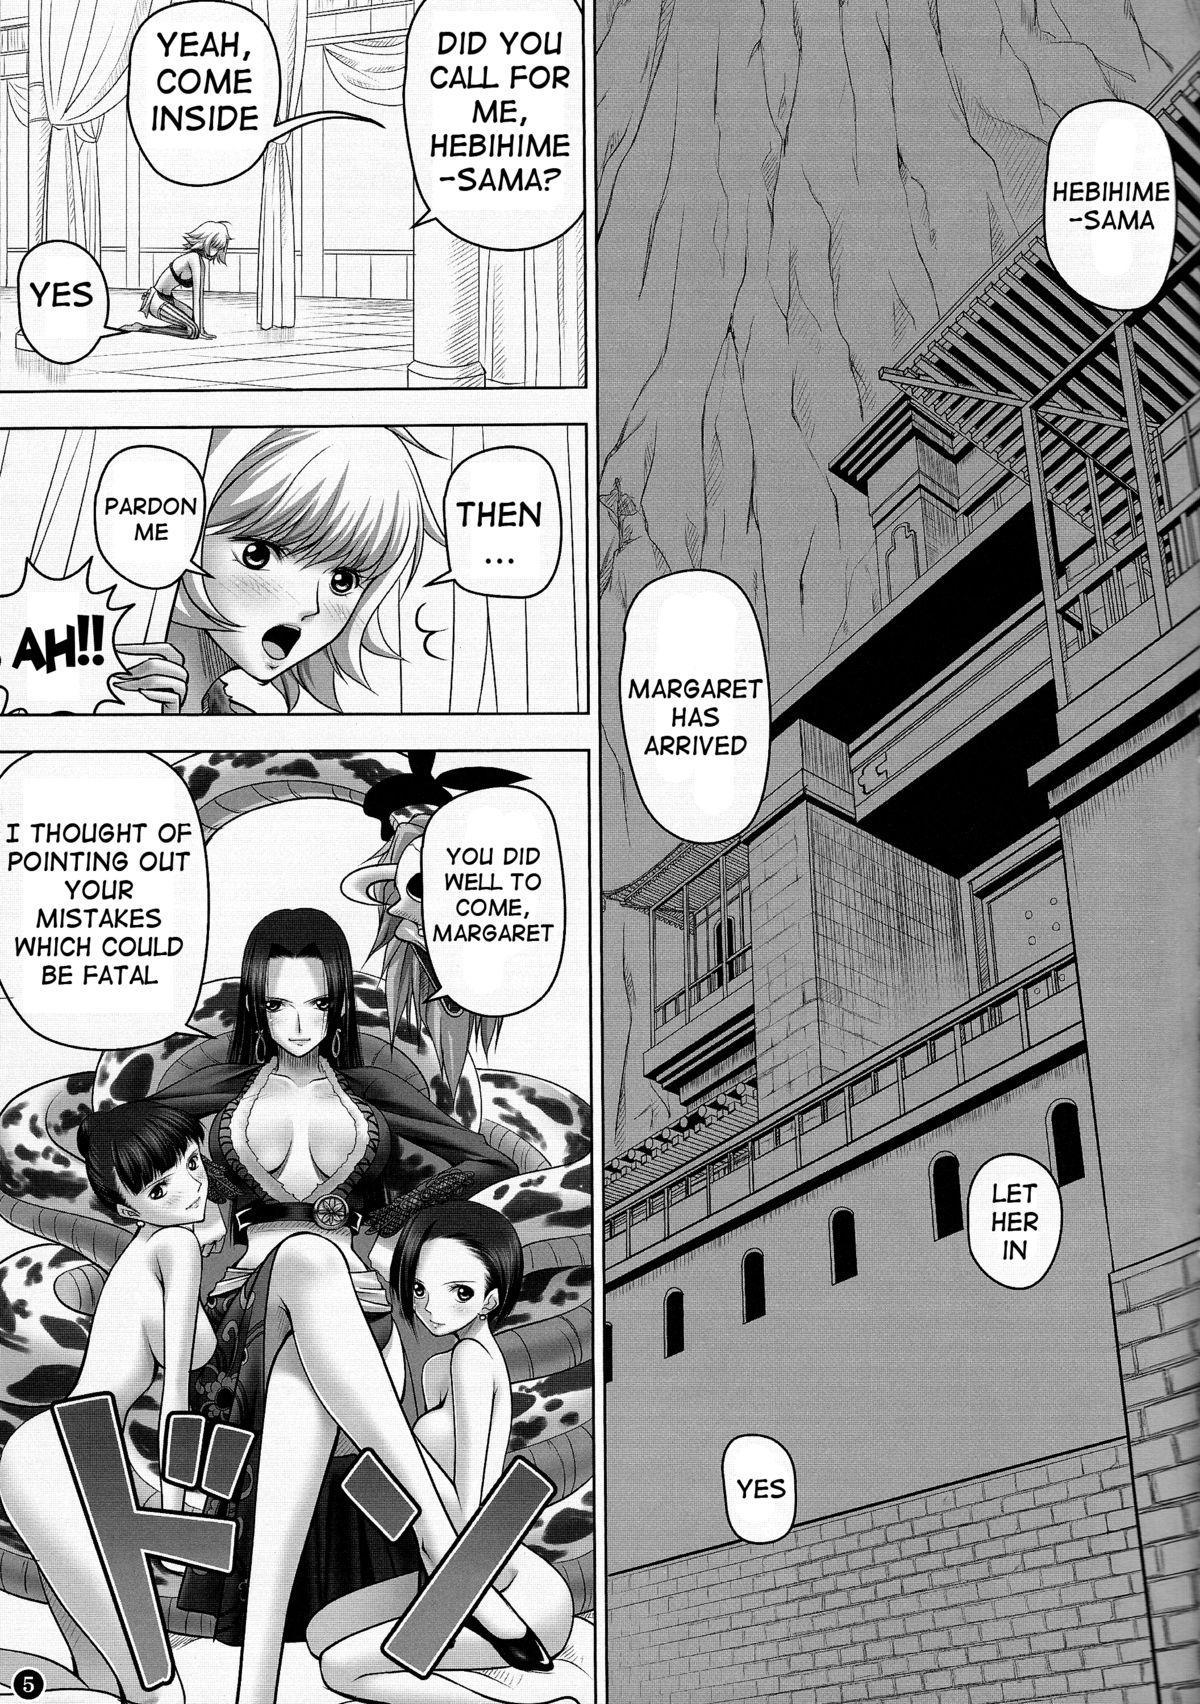 (C84) [Mikenekodou (Muten)] Hebihime-sama to Warui Mushi | Hebihime-Sama Punishes Margaret (One Piece) [English] {doujin-moe.us} 3